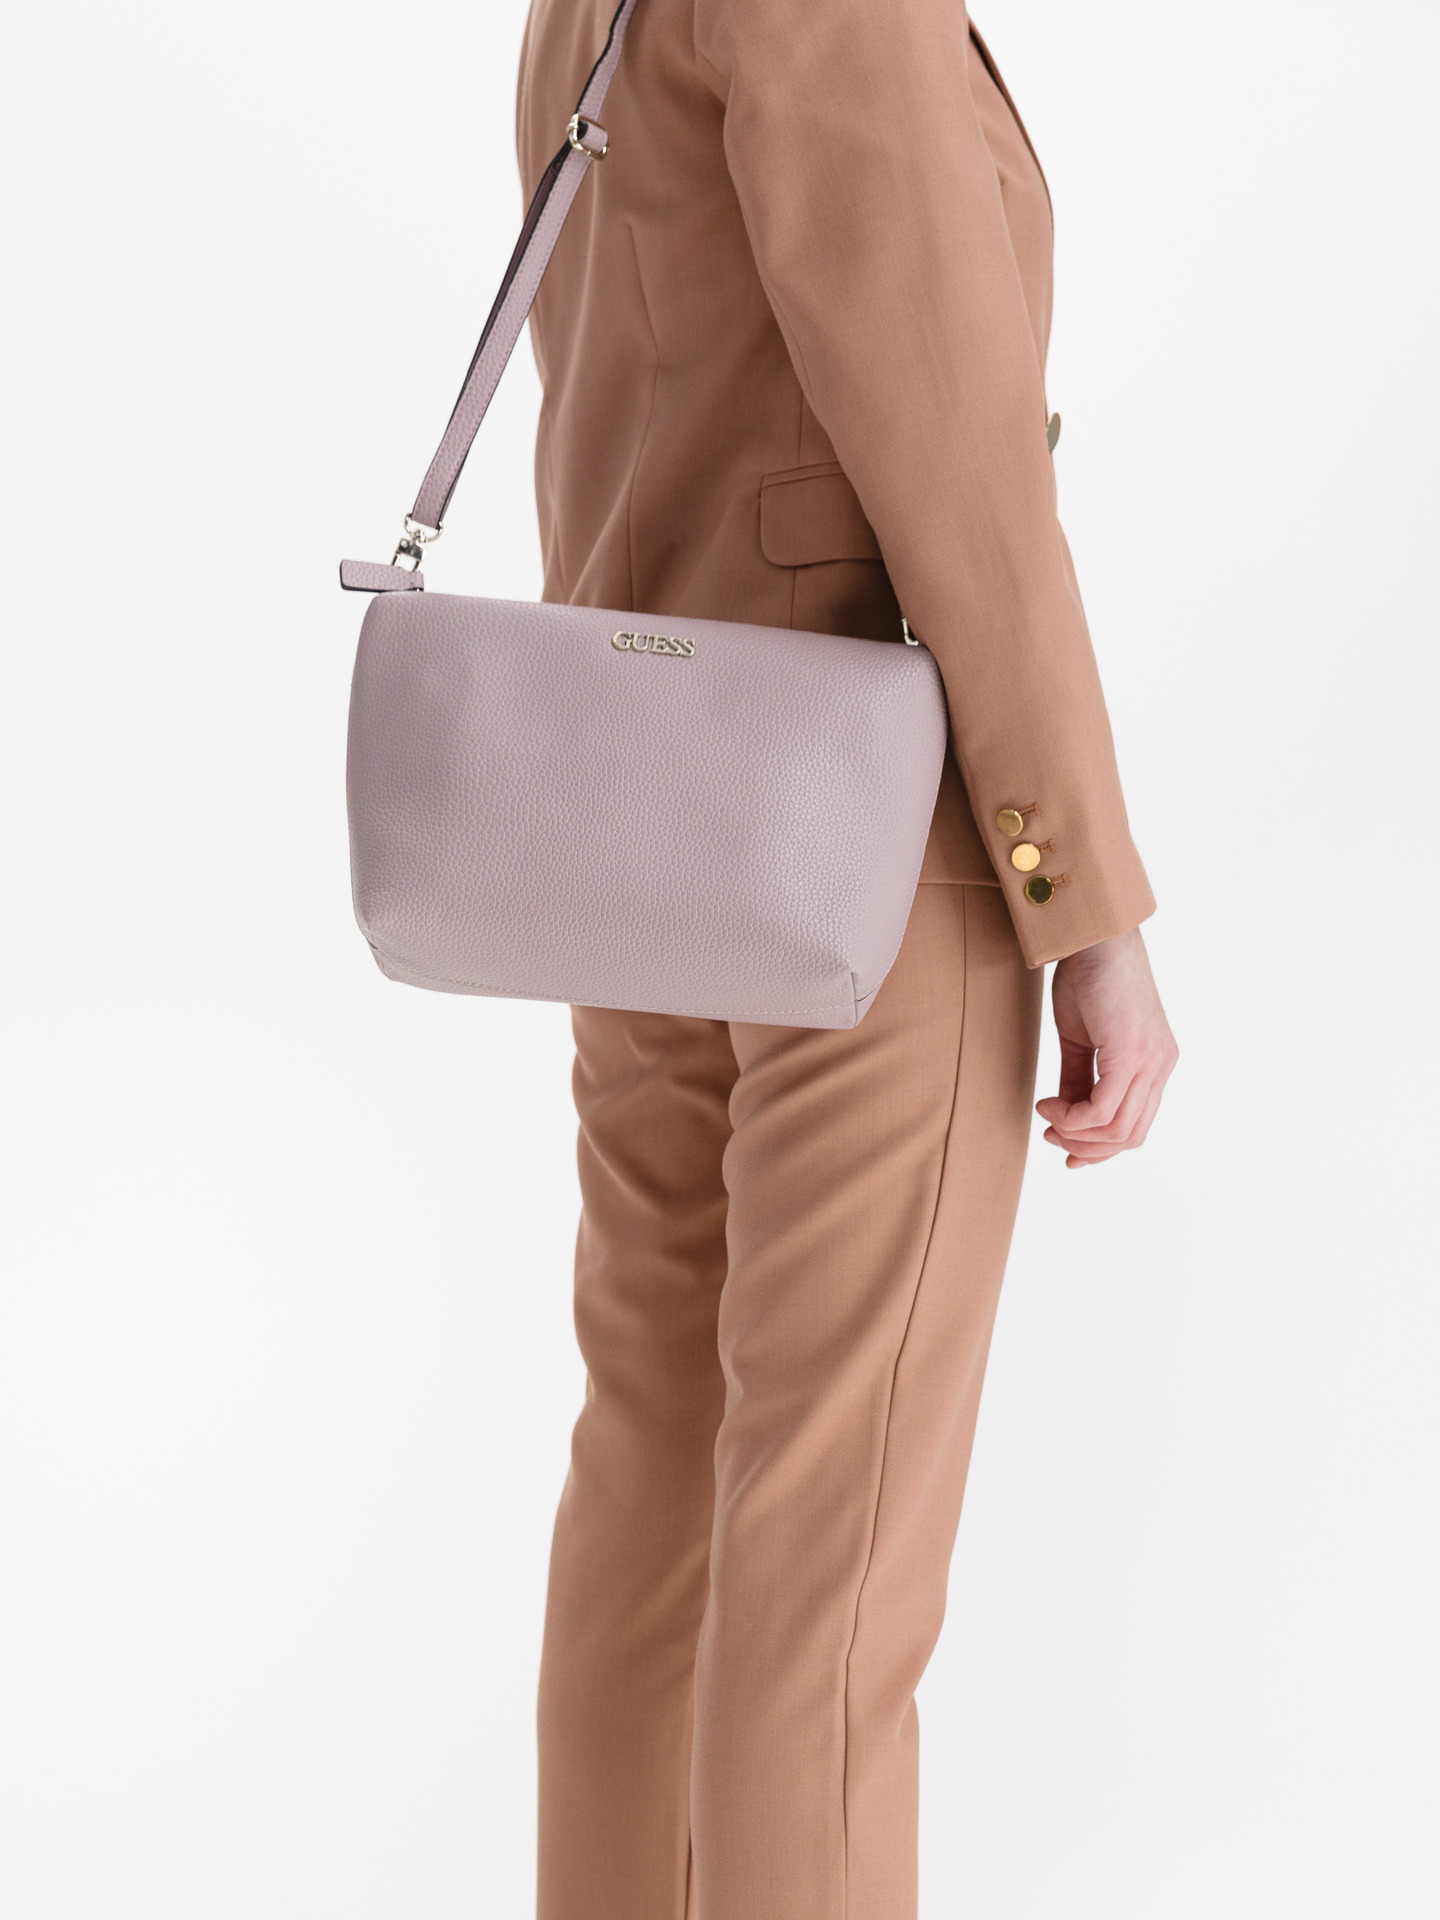 Guess 3in1 handbag Alby